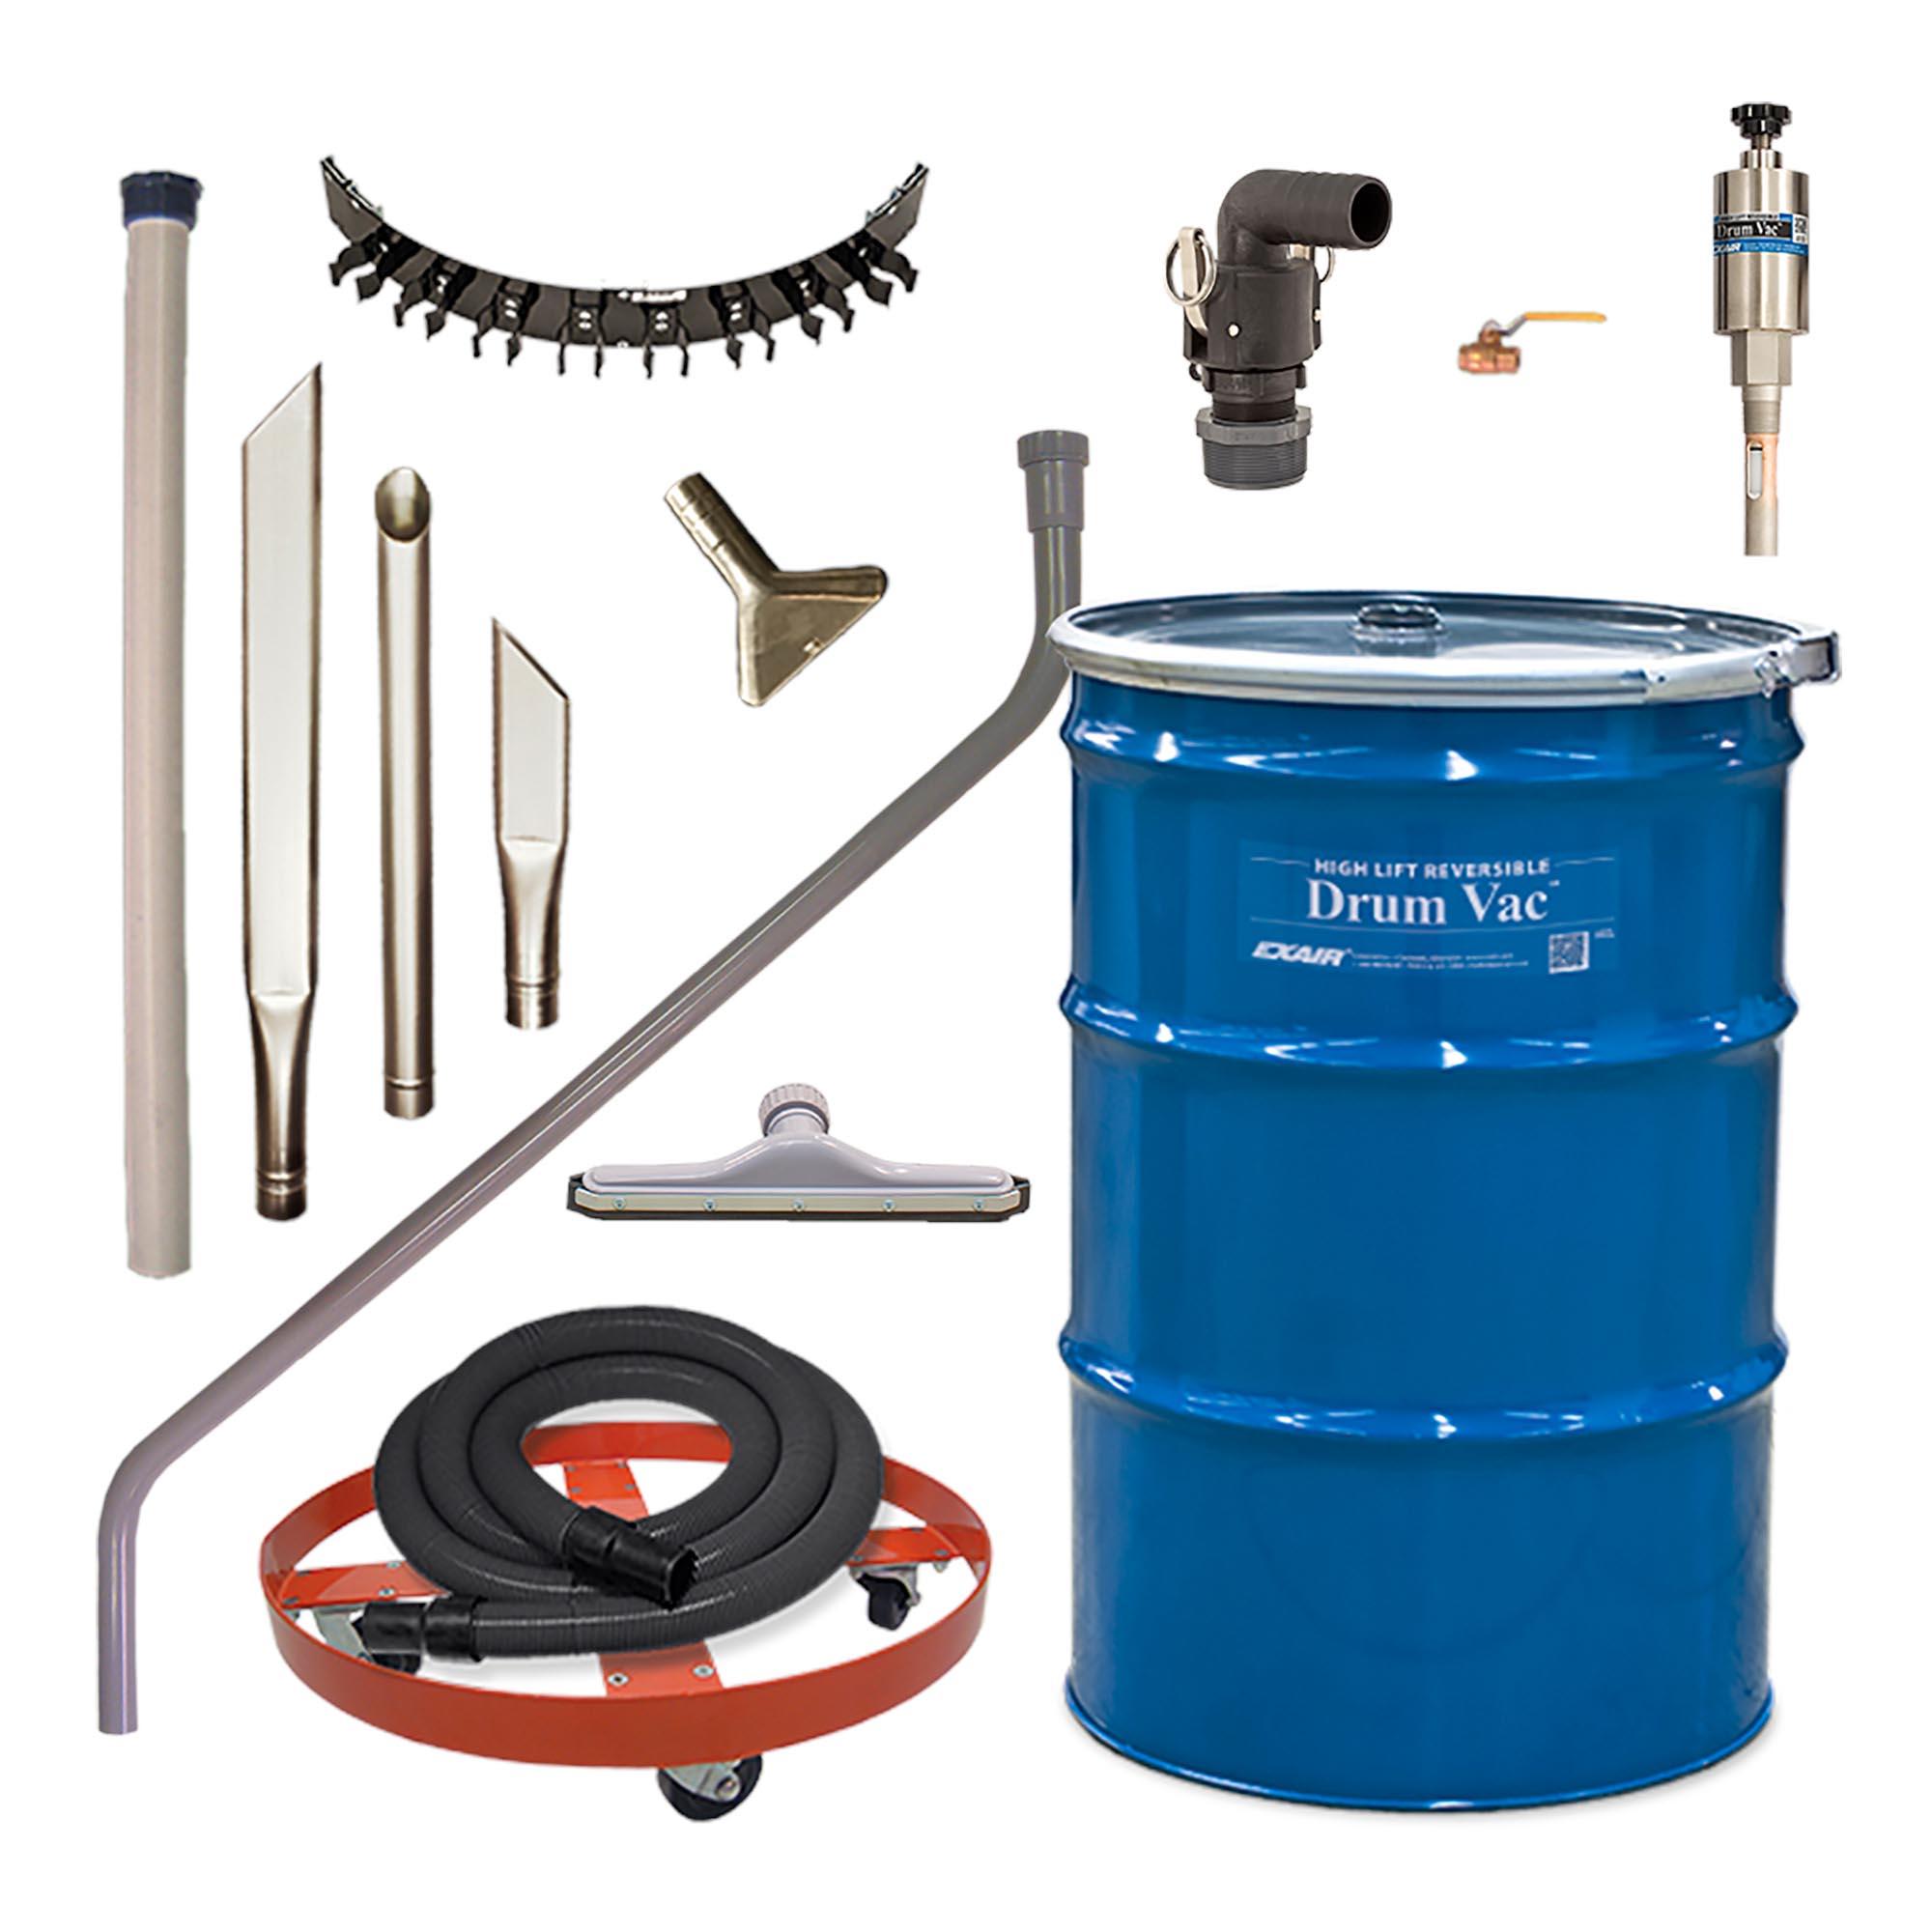 Model 6395 55 Gallon Premium High Lift Reversible Drum Vac System